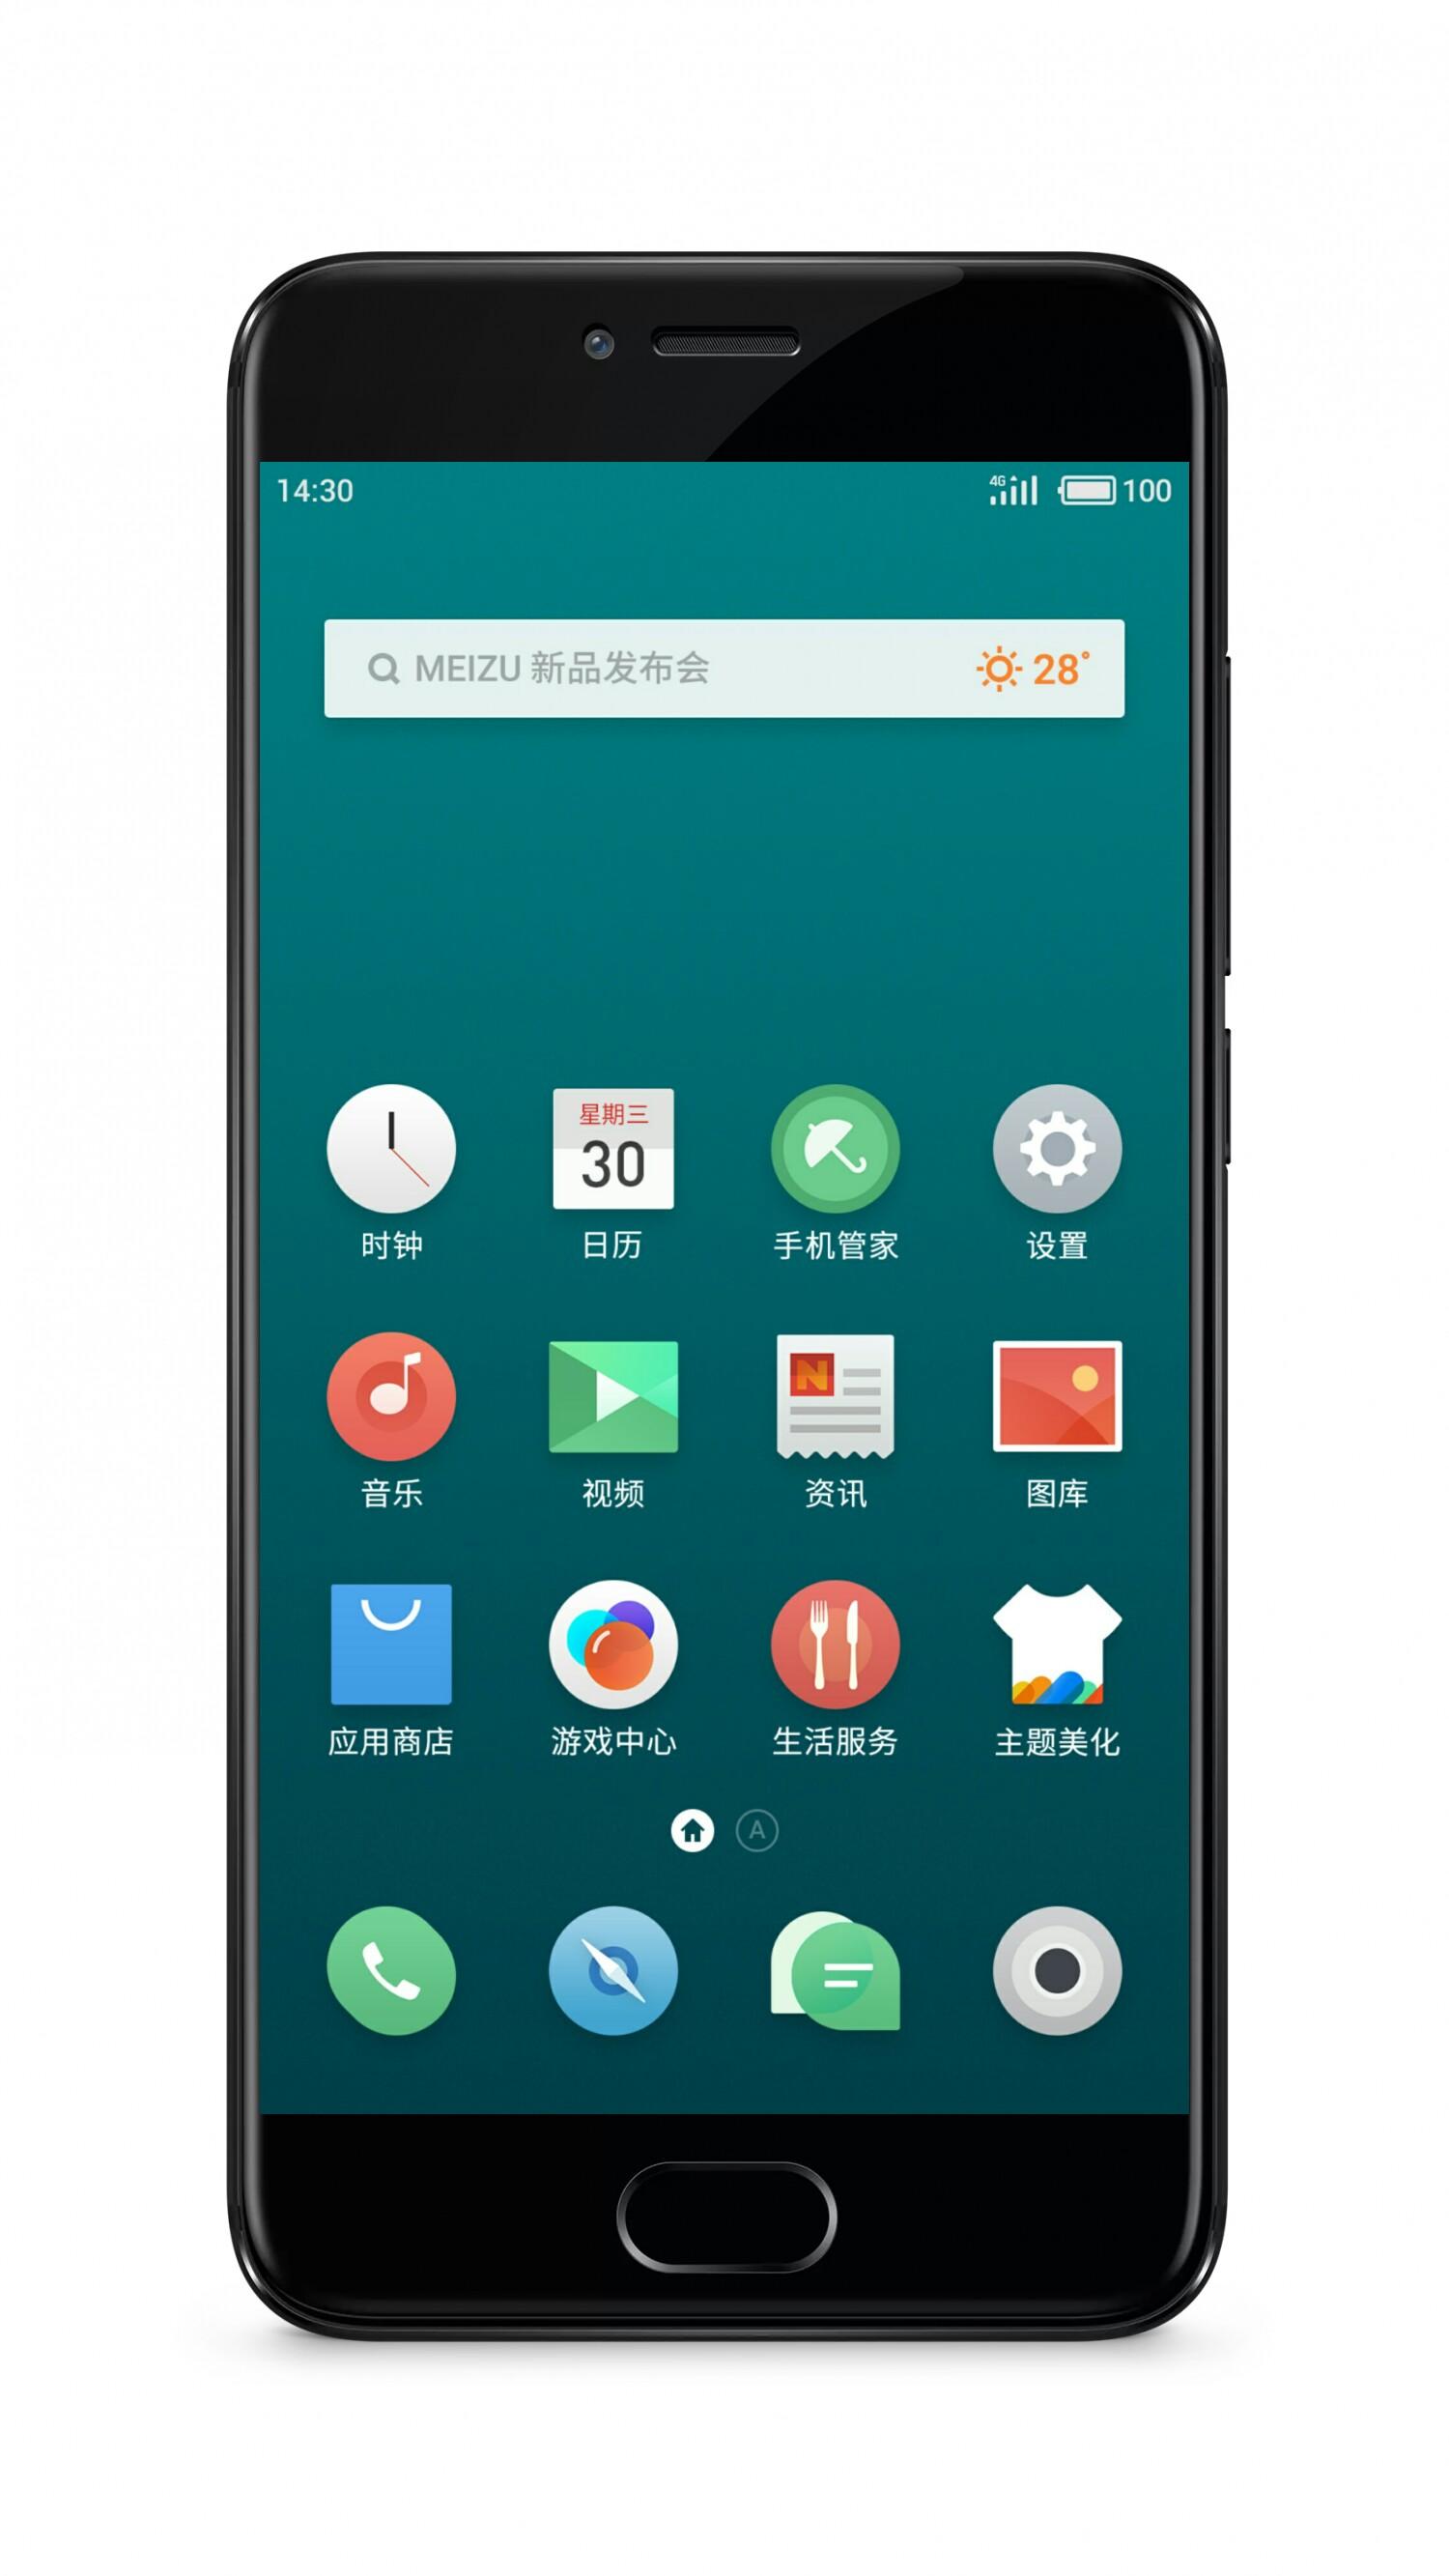 Meizu Pro 7 preview 2.jpg